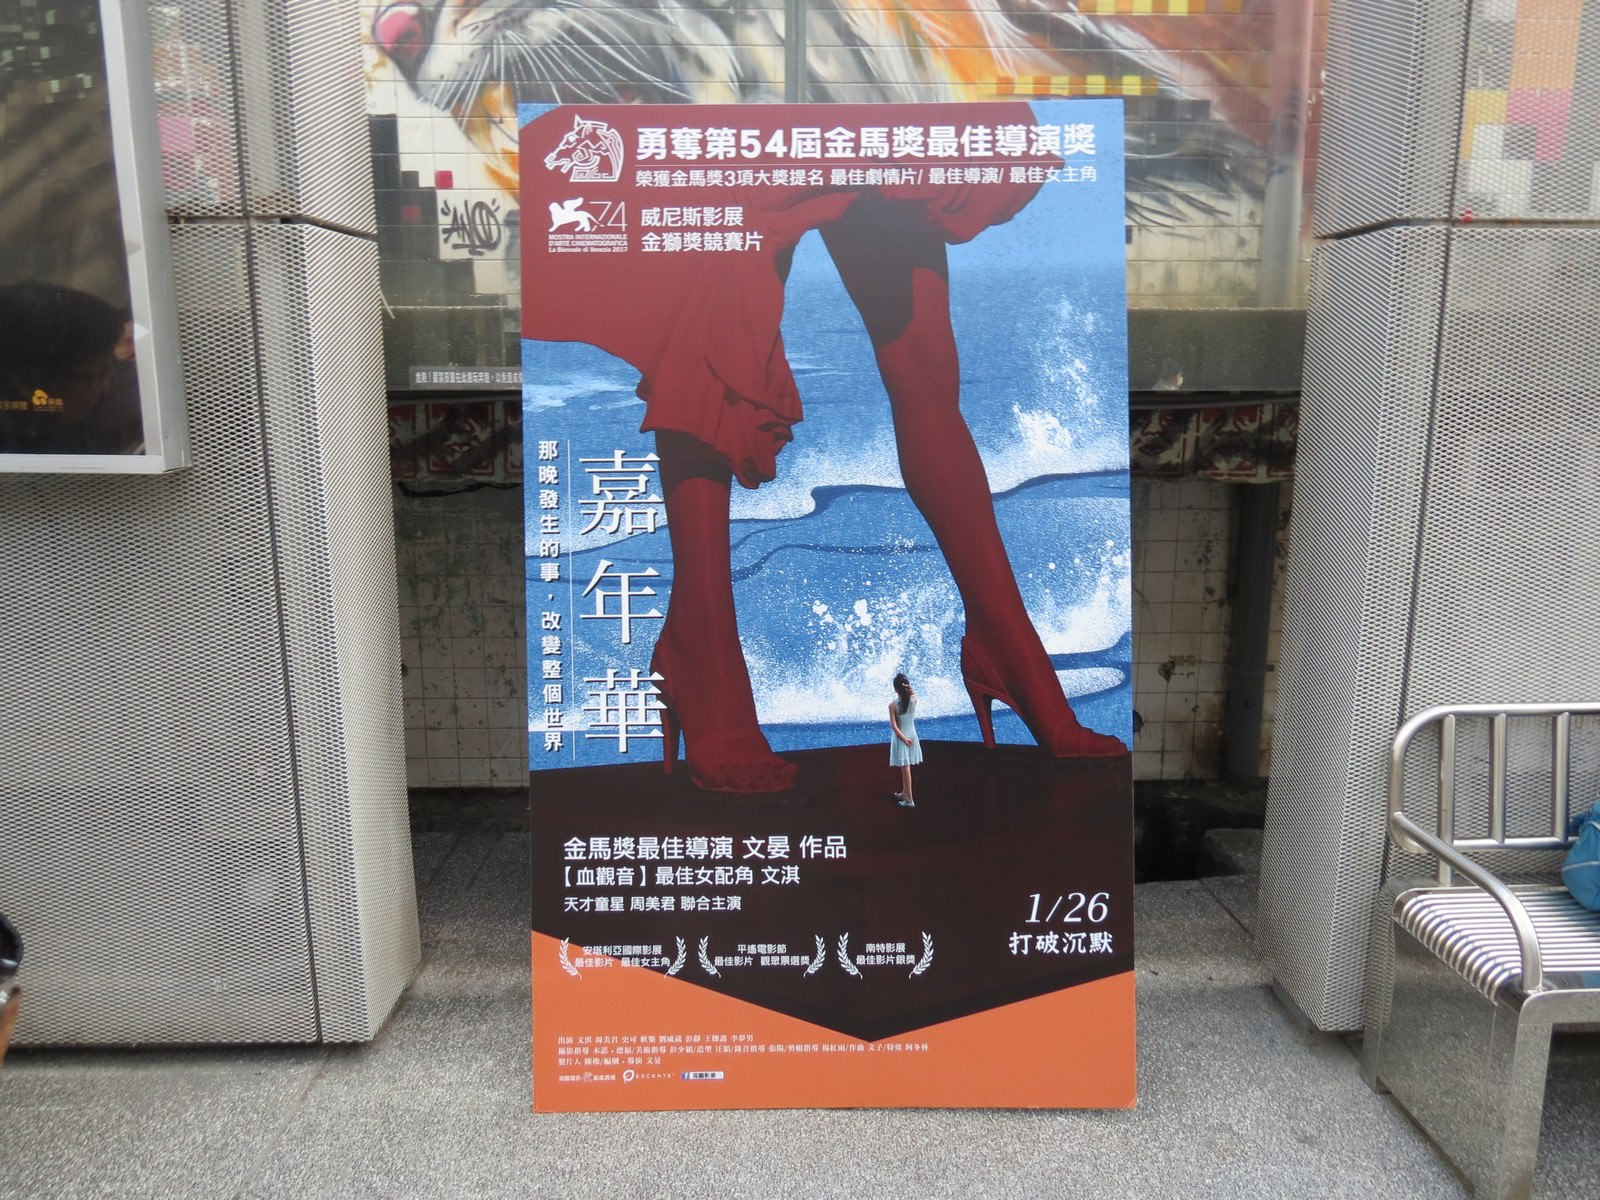 Movie, 嘉年华(中國.法國, 2017) / 嘉年華(台灣) / Angels Wear White(英文), 電影海報, 廣告看板, 光點華山